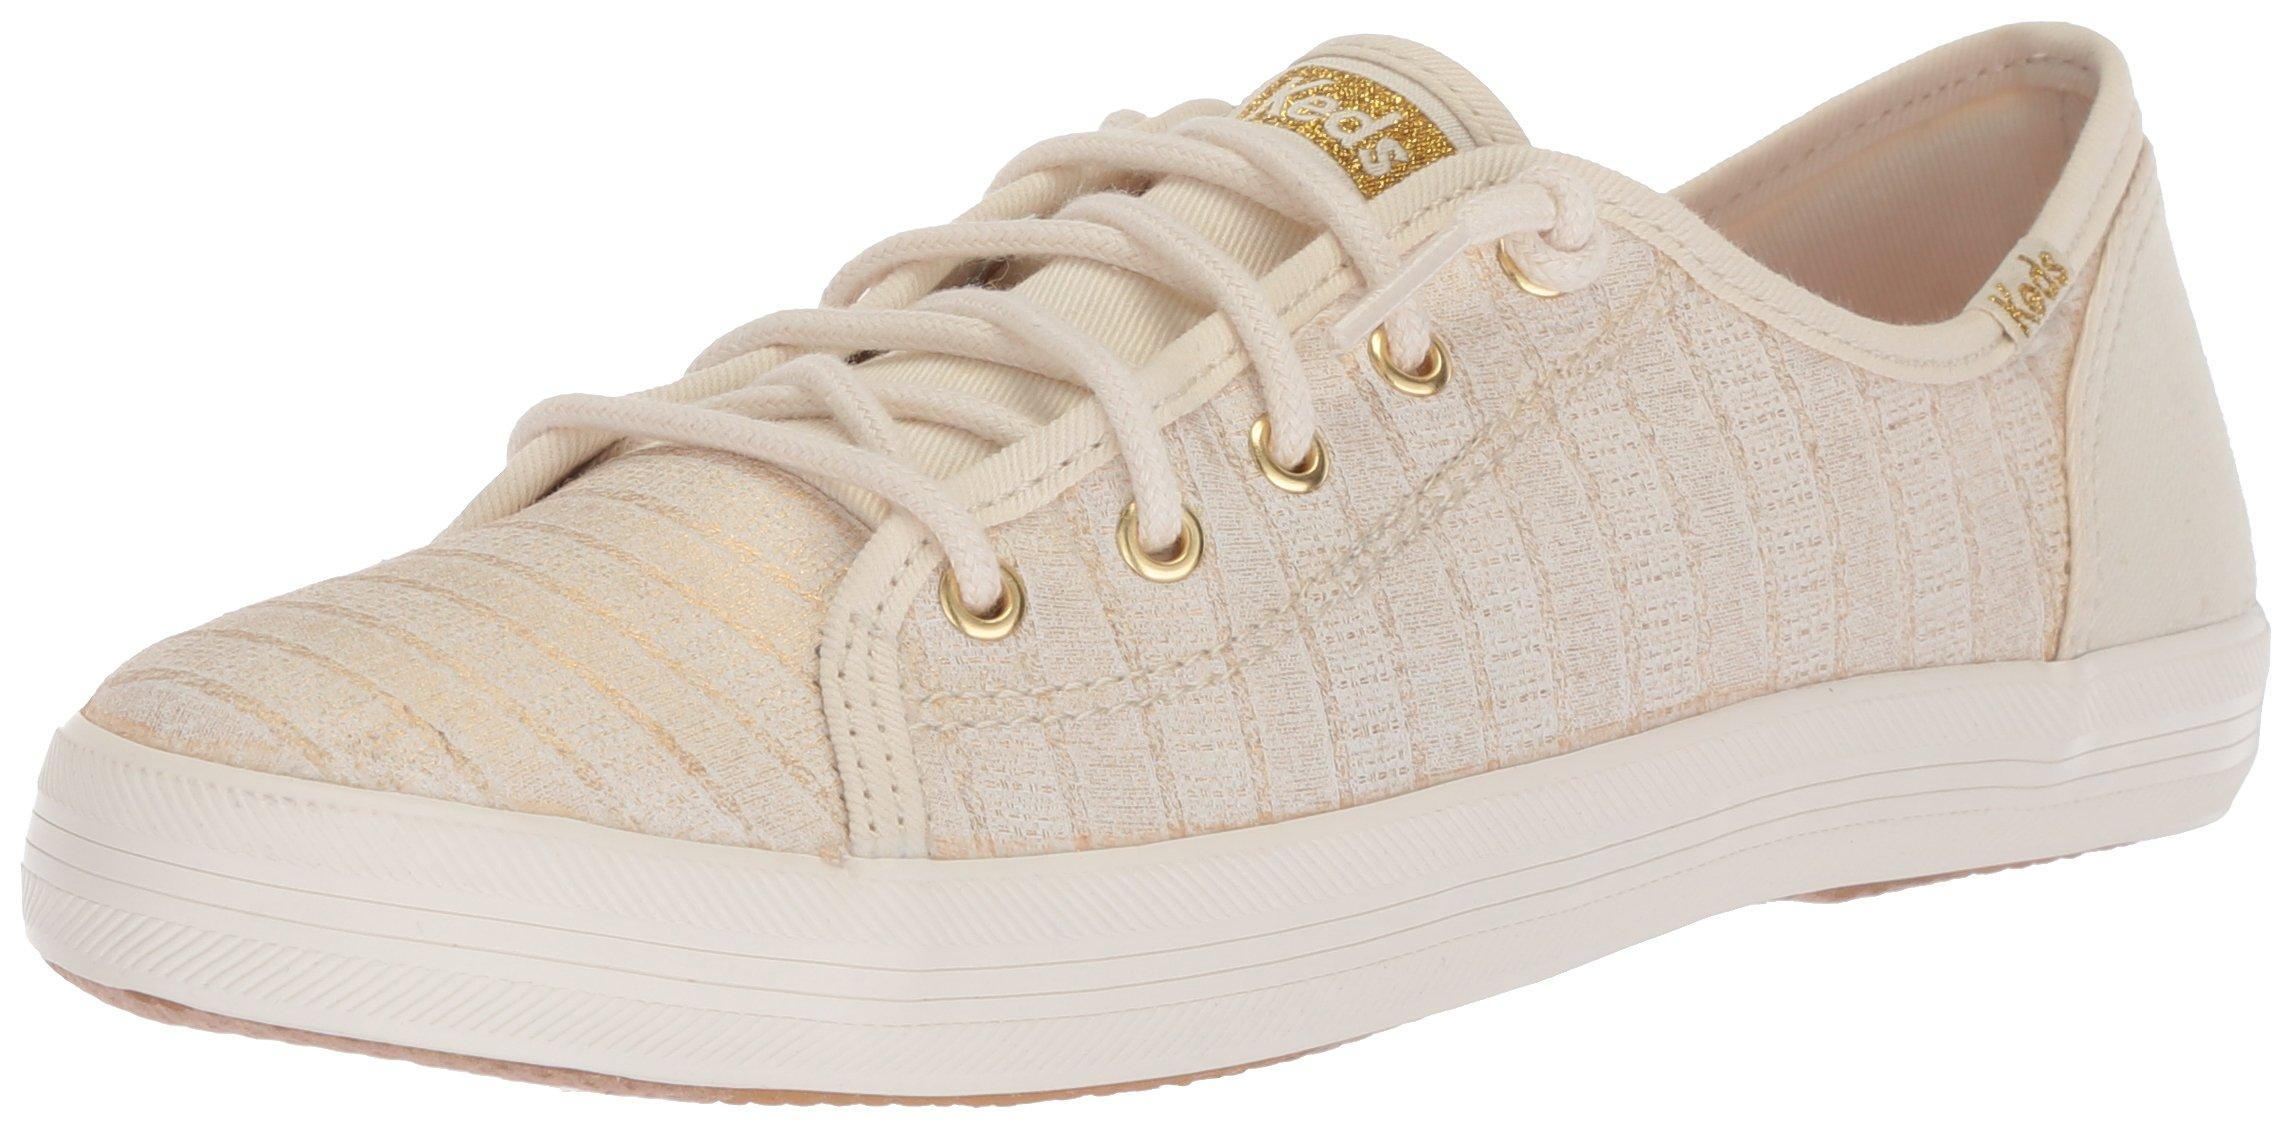 Keds Girls' Kickstart Seasonal Sneaker, White, 5